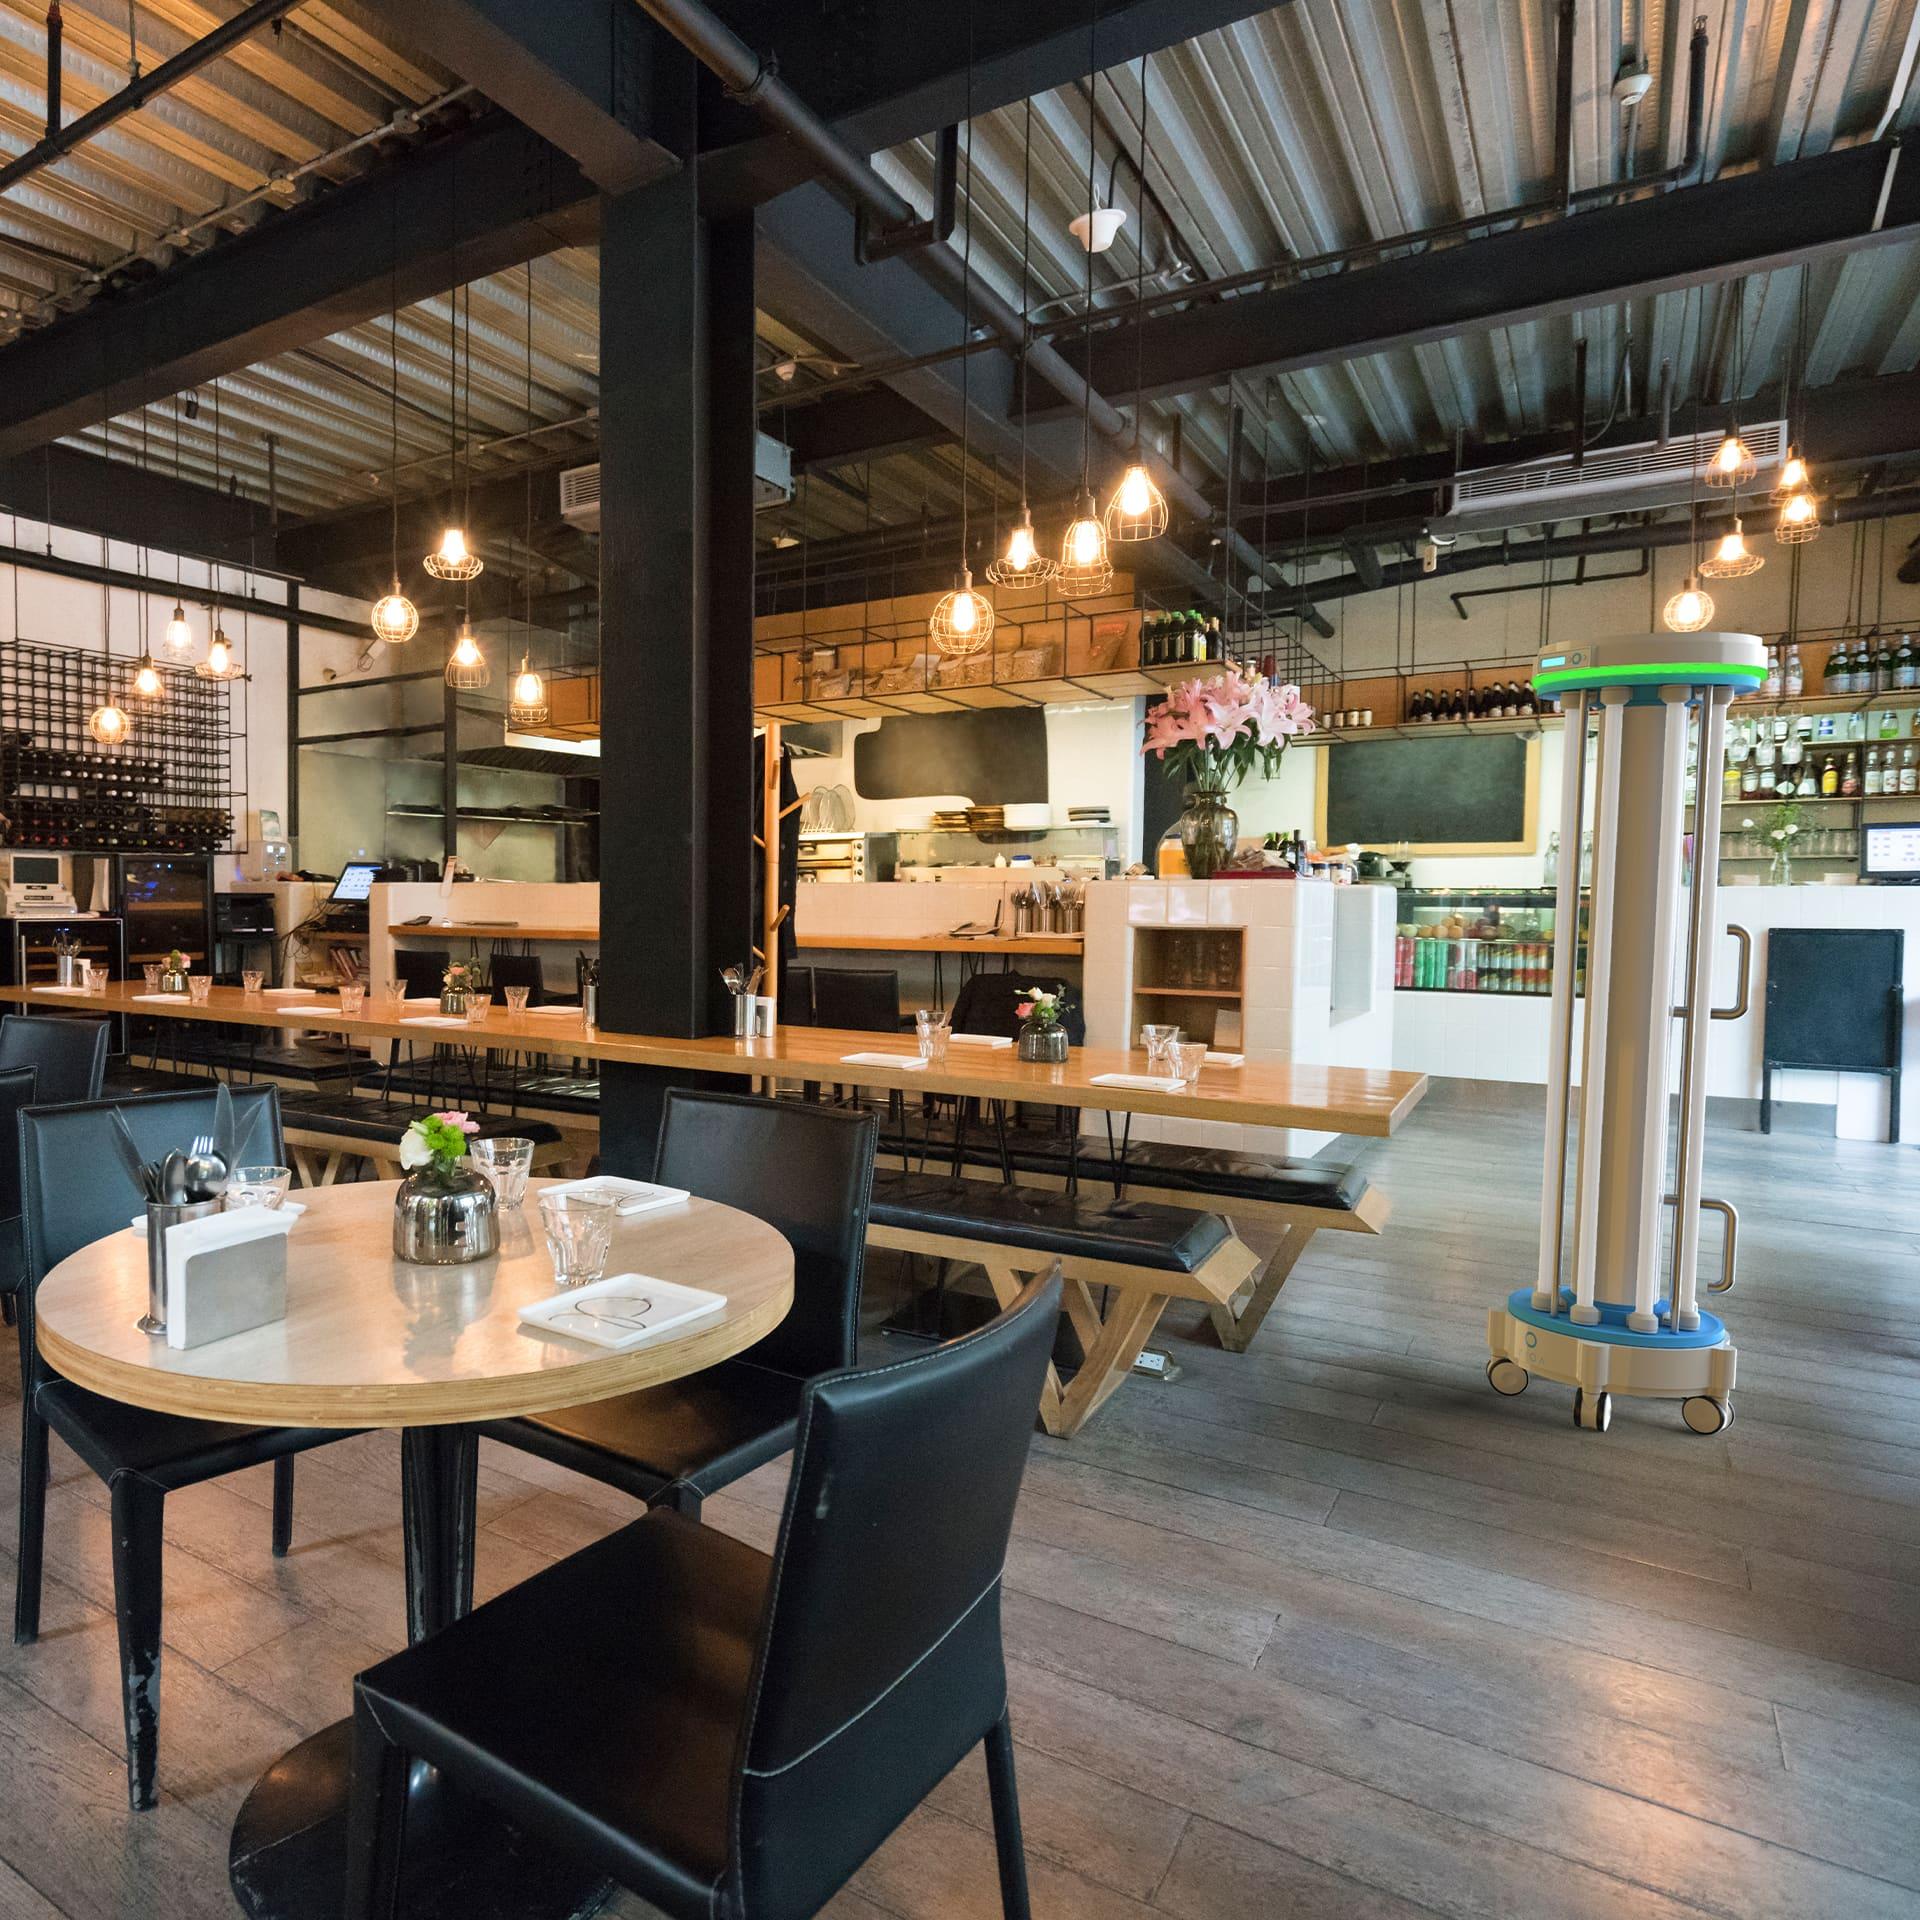 UV cleaning restaurant, UVC disinfection bars